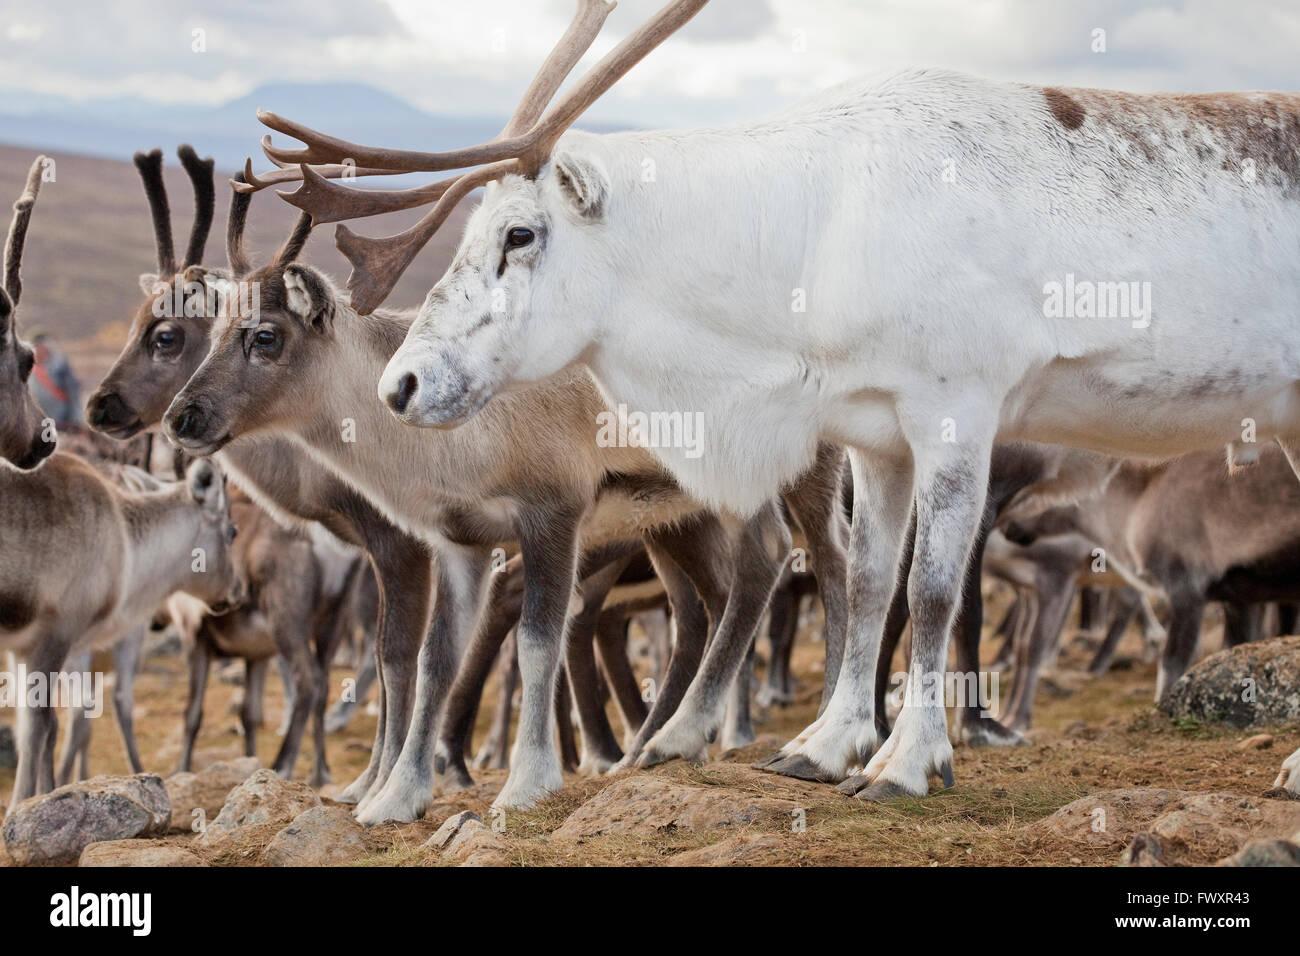 Sweden, Lapland, Levas, White reindeer (Rangifer tarandus) in front of herd - Stock Image